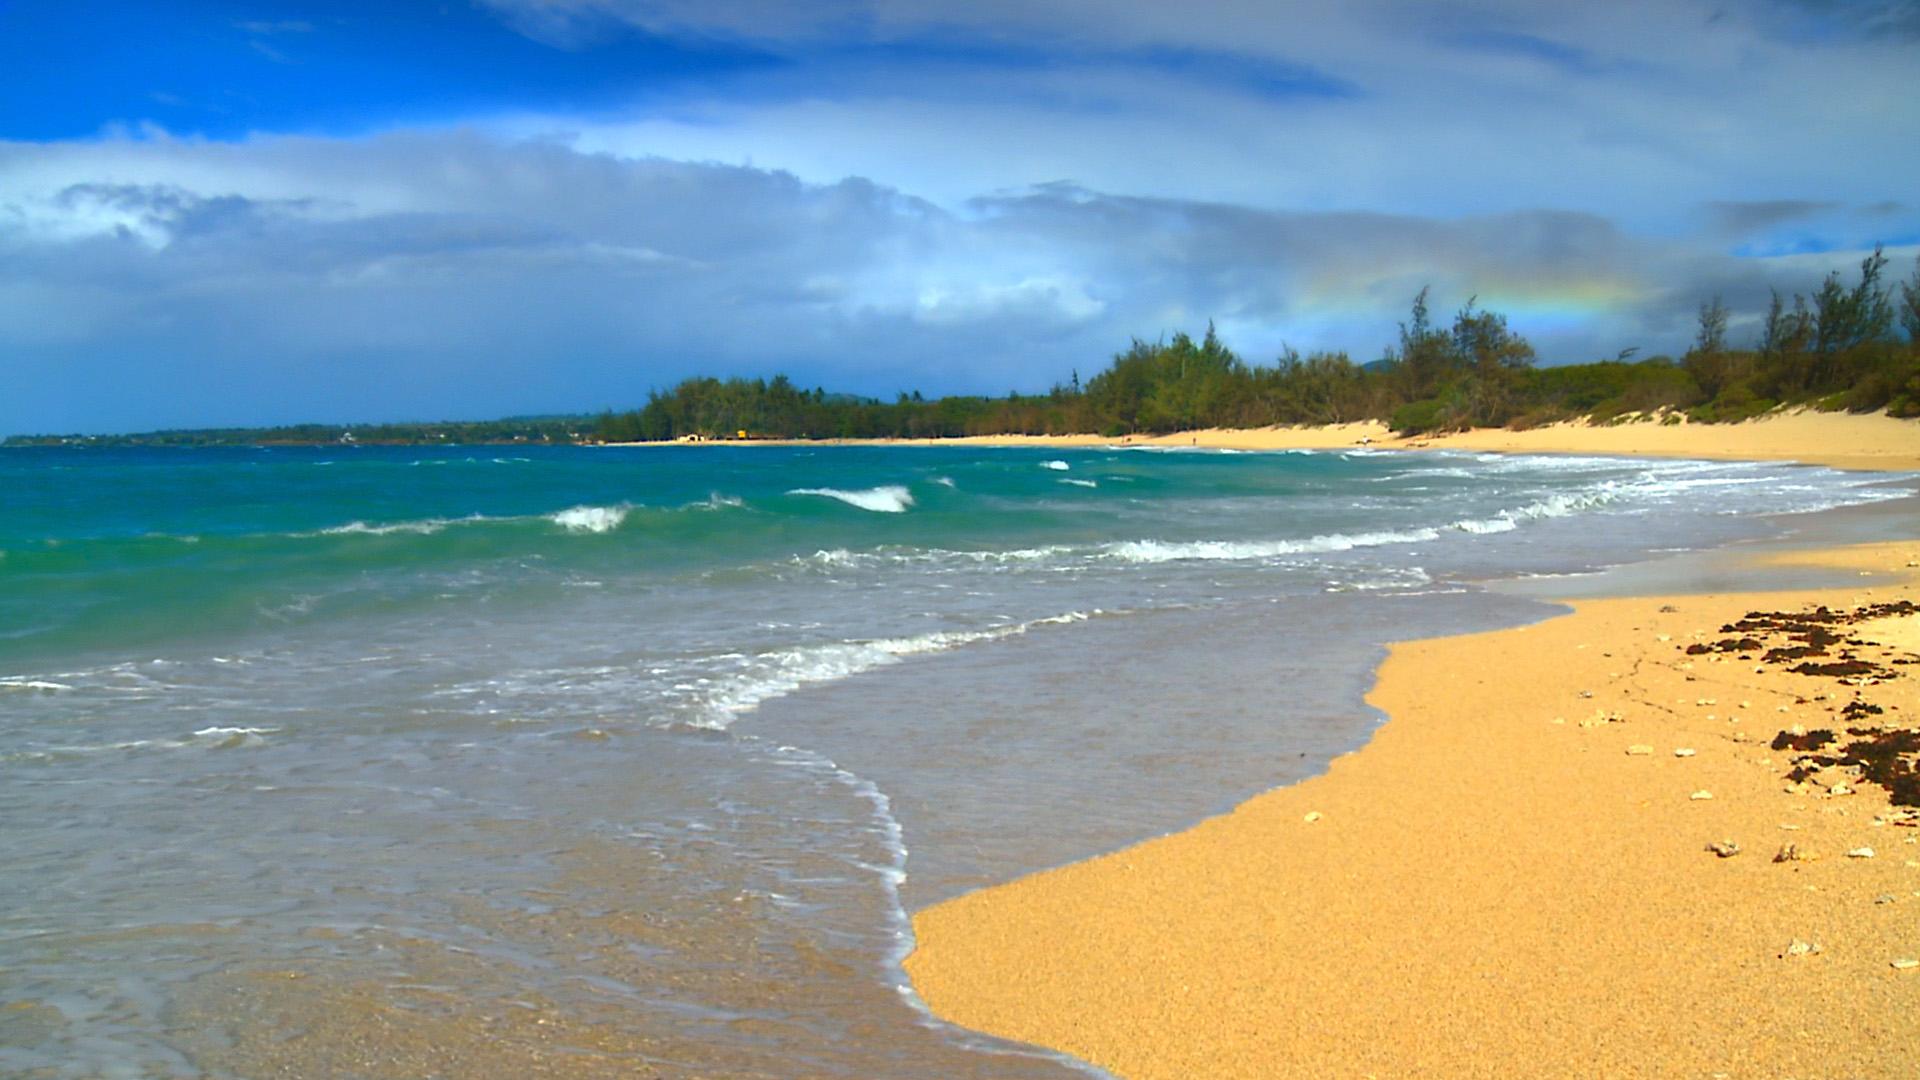 hawaii, photos, background, screensaver, beach, beaches, media ...